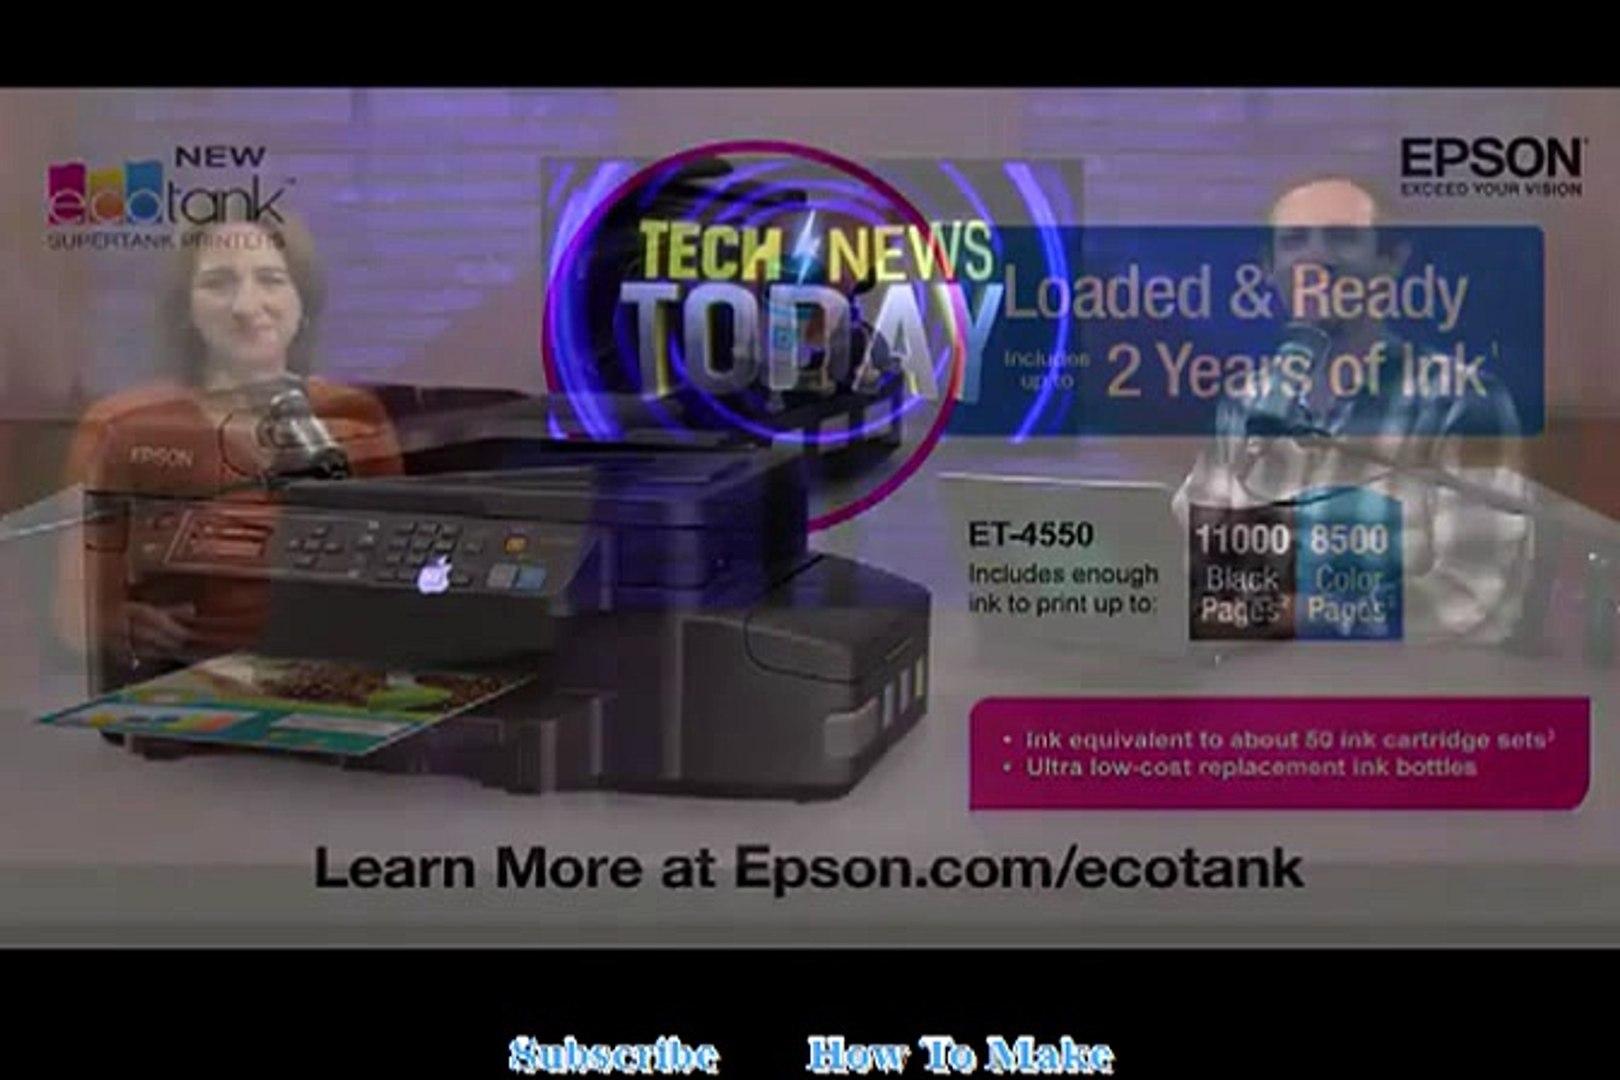 New Latest Technology News 2016